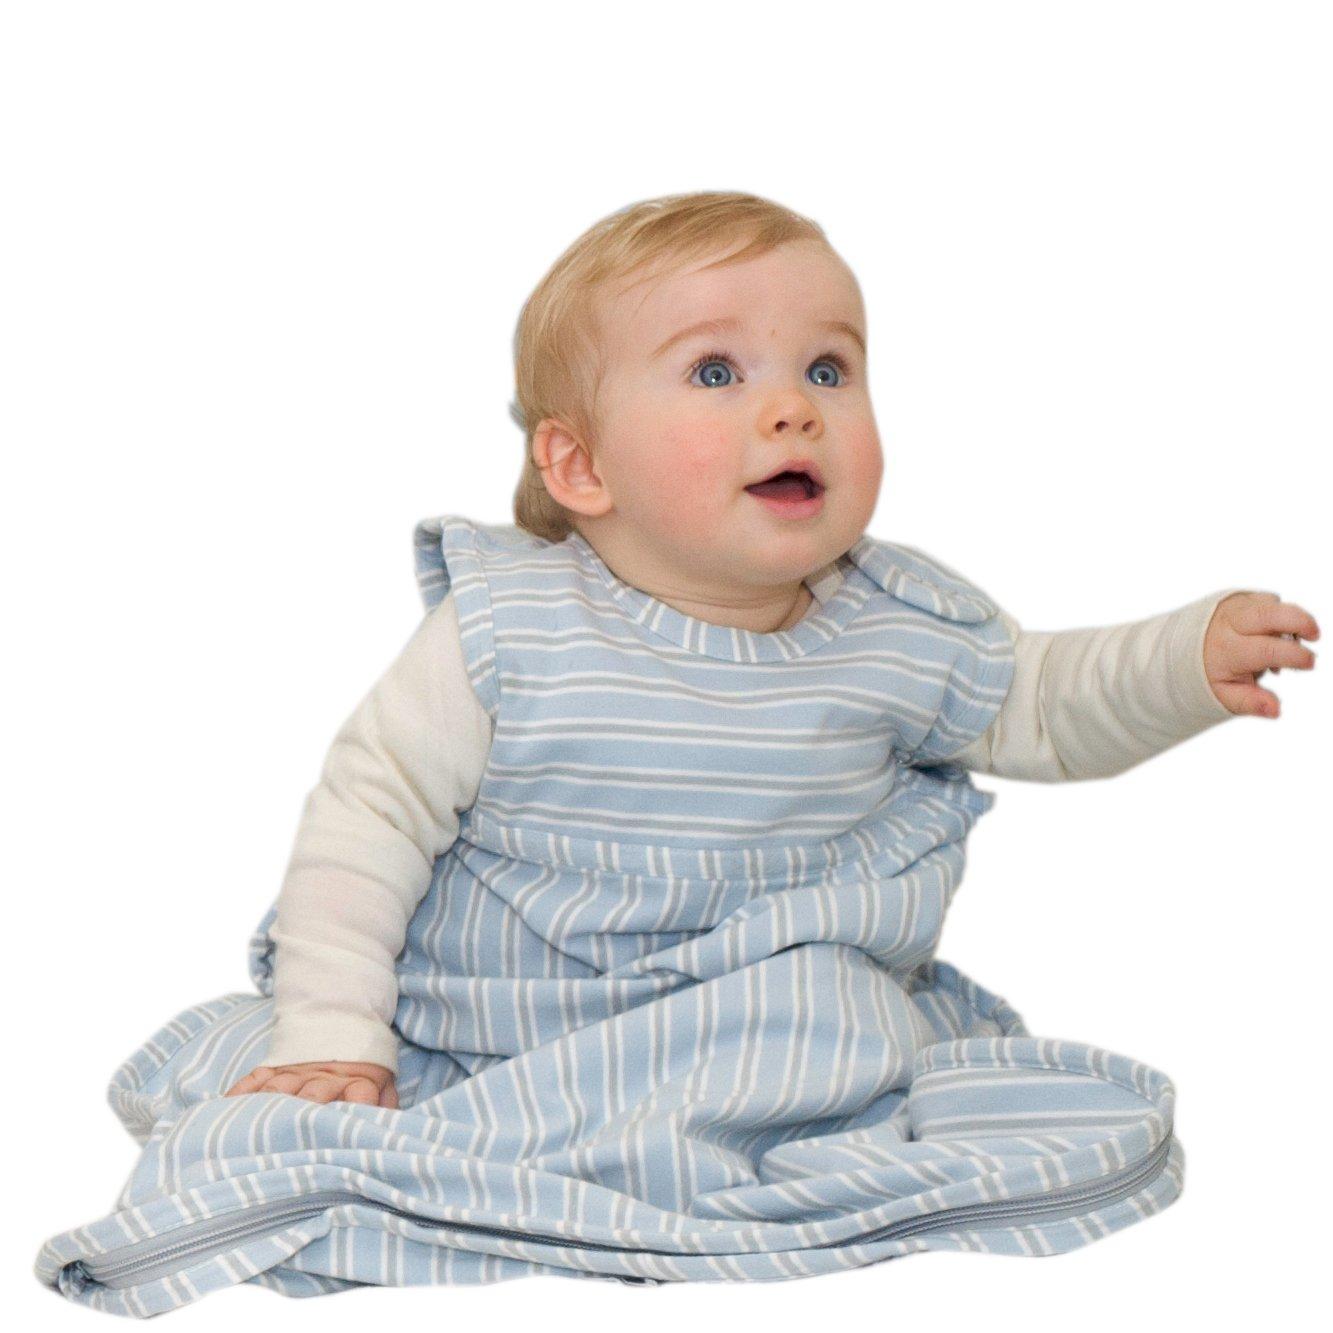 Merino Kids Baby Sleep Bag for Toddlers 2-4 Years, Sky/Light Grey Stripe